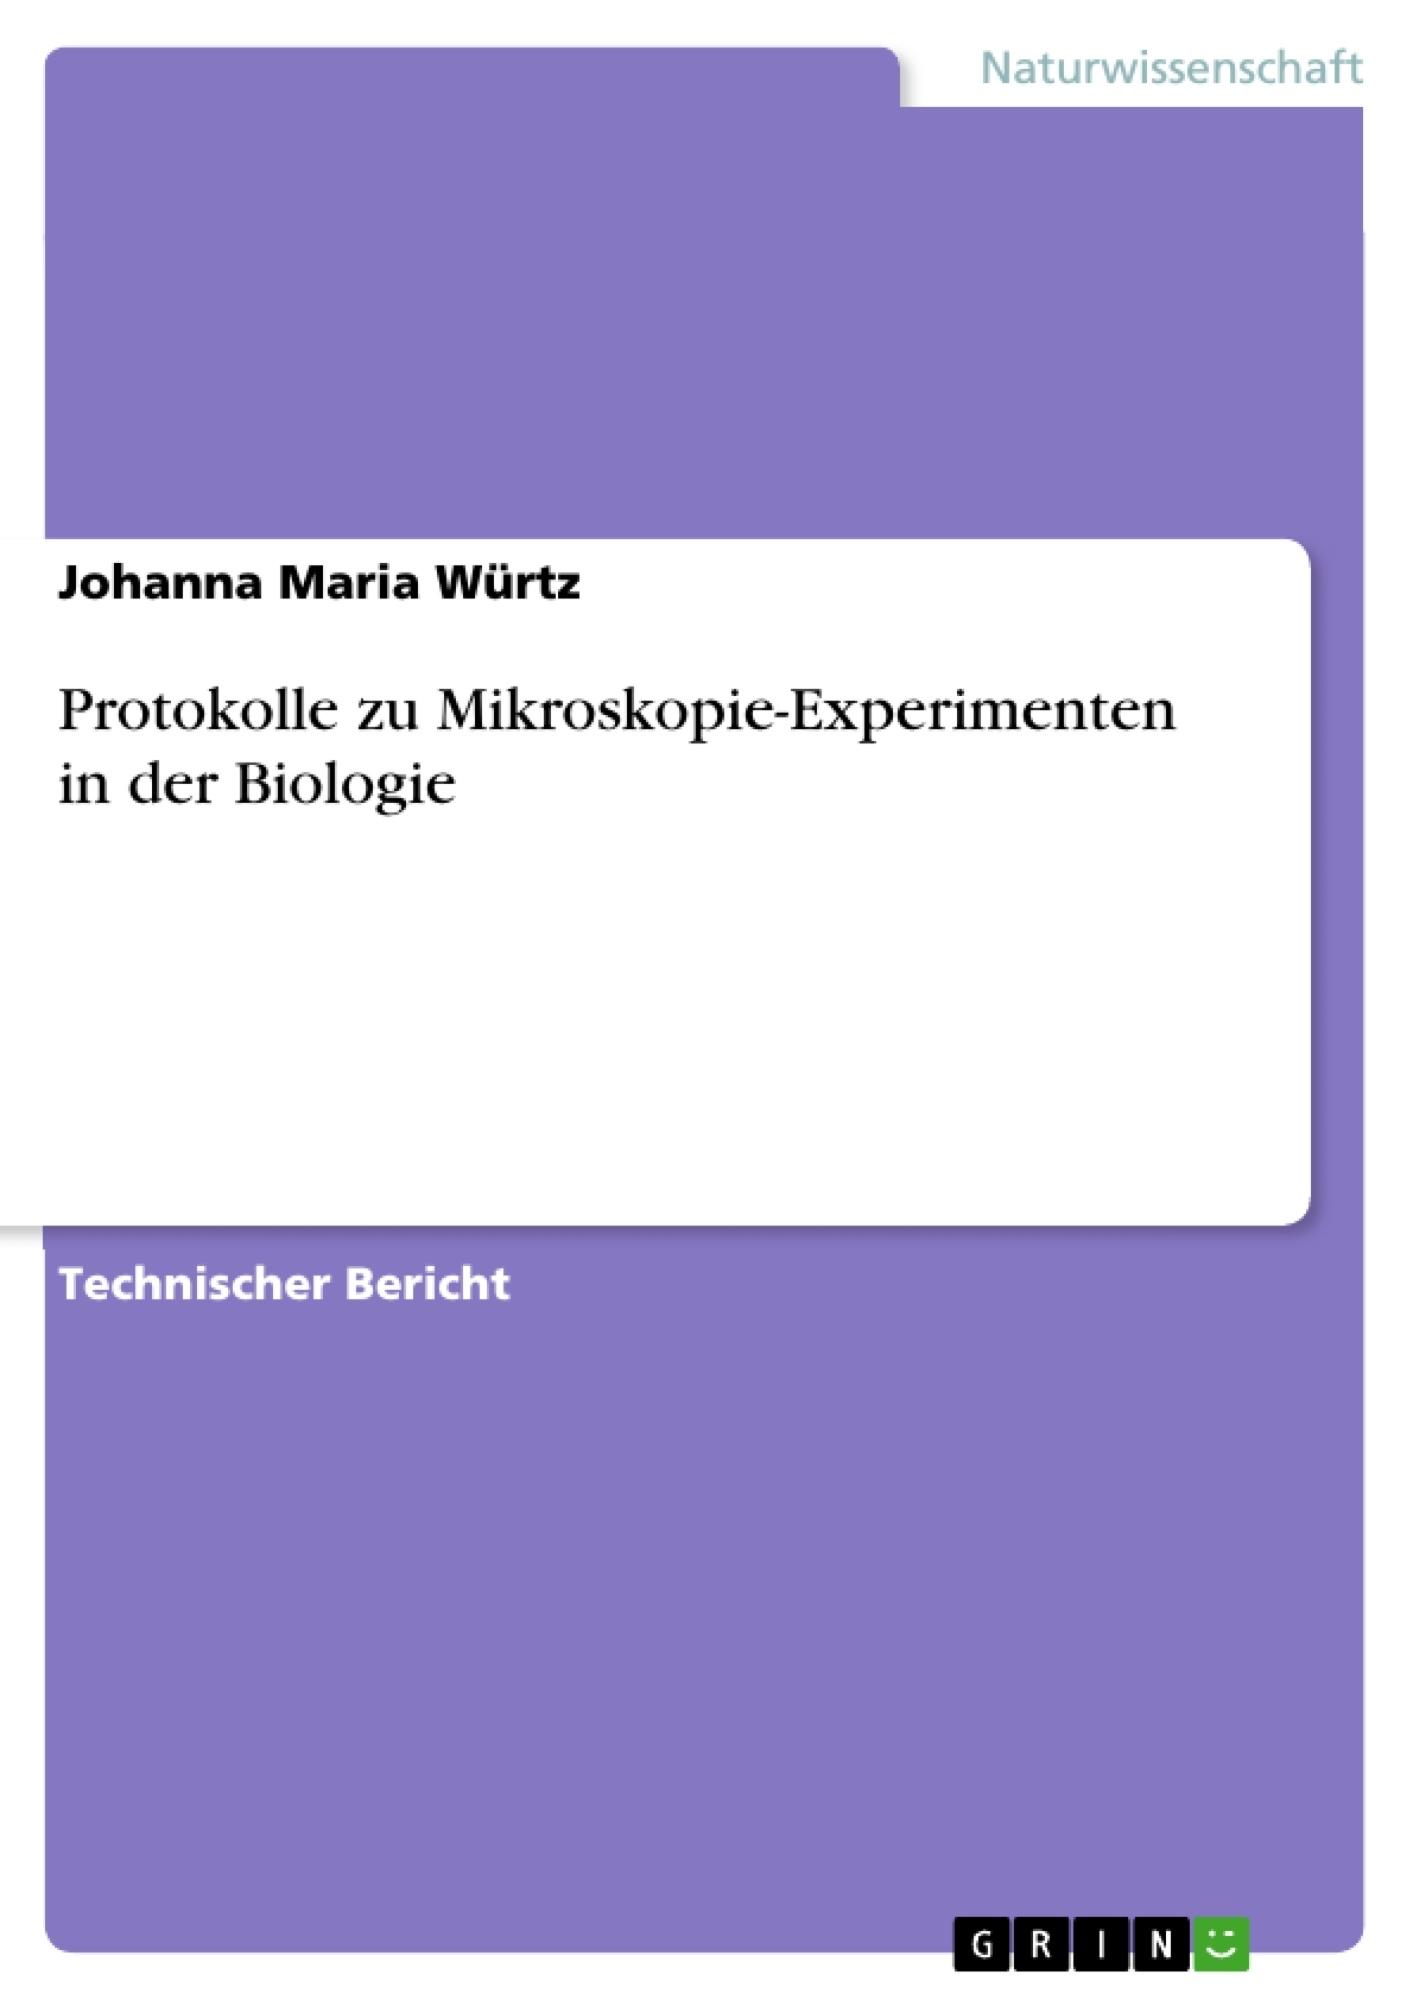 Titel: Protokolle zu Mikroskopie-Experimenten in der Biologie